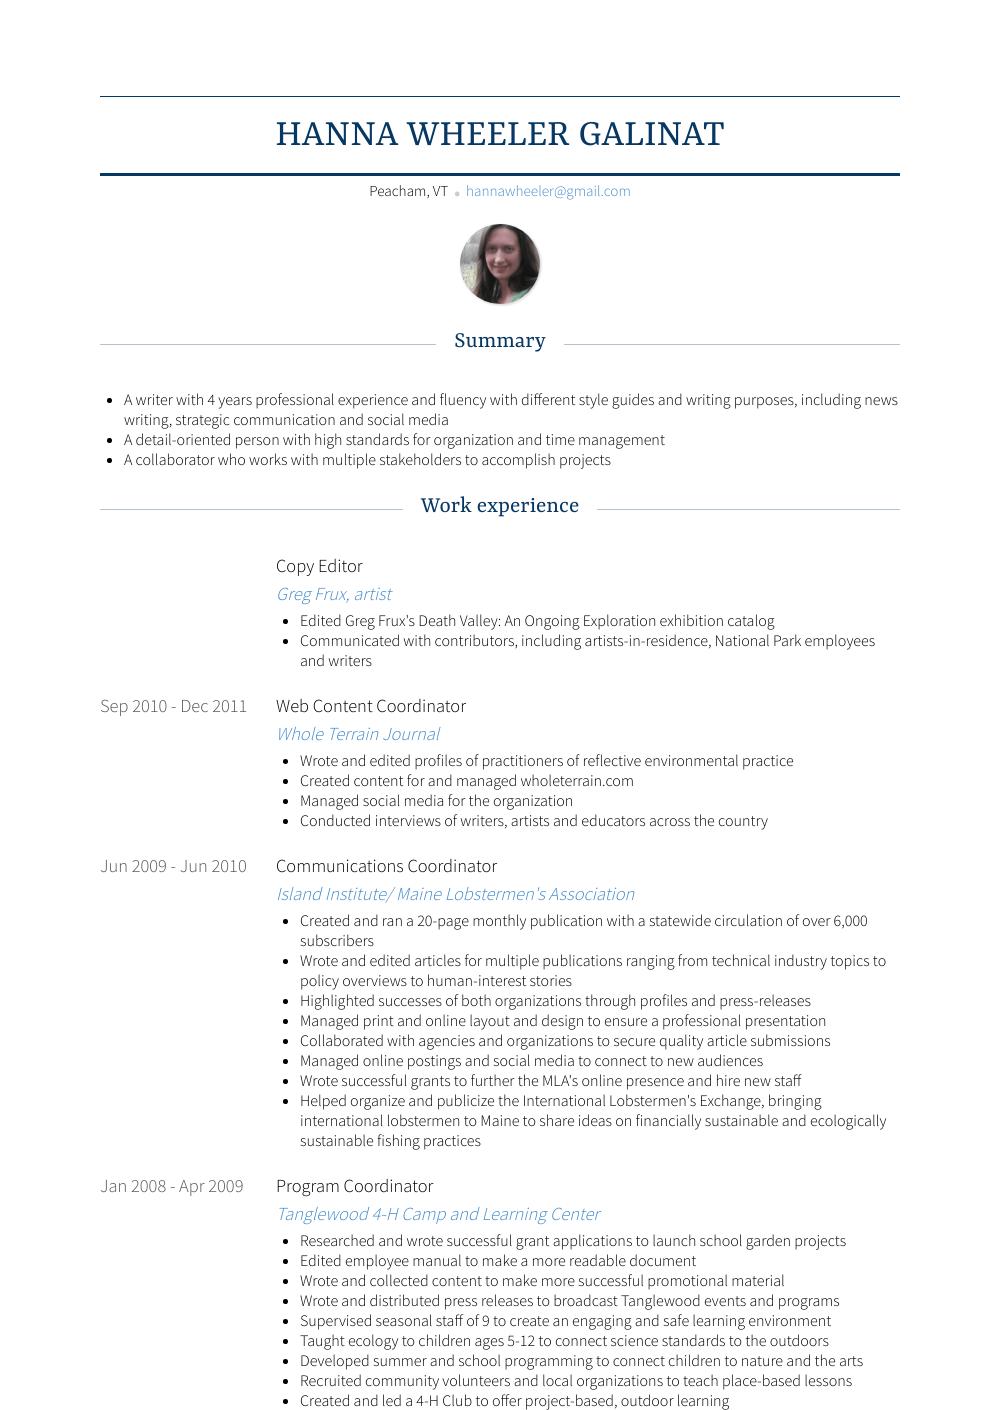 Copy Editor Resume Samples Templates Visualcv